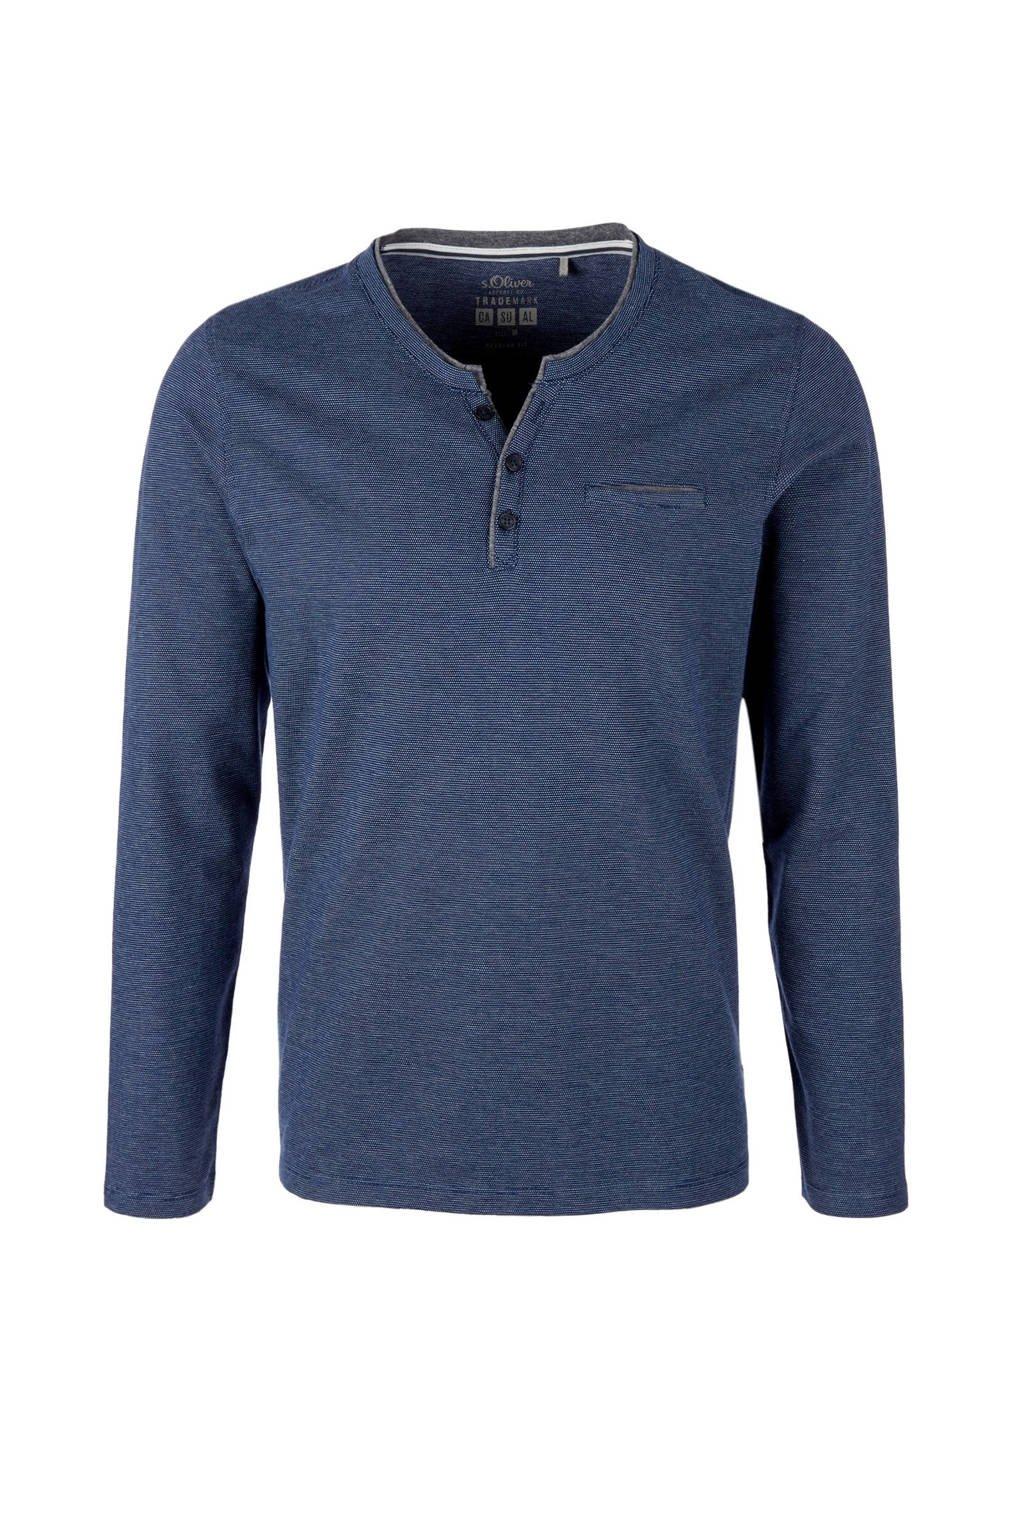 s.Oliver T-shirt lange mouw, Blauw